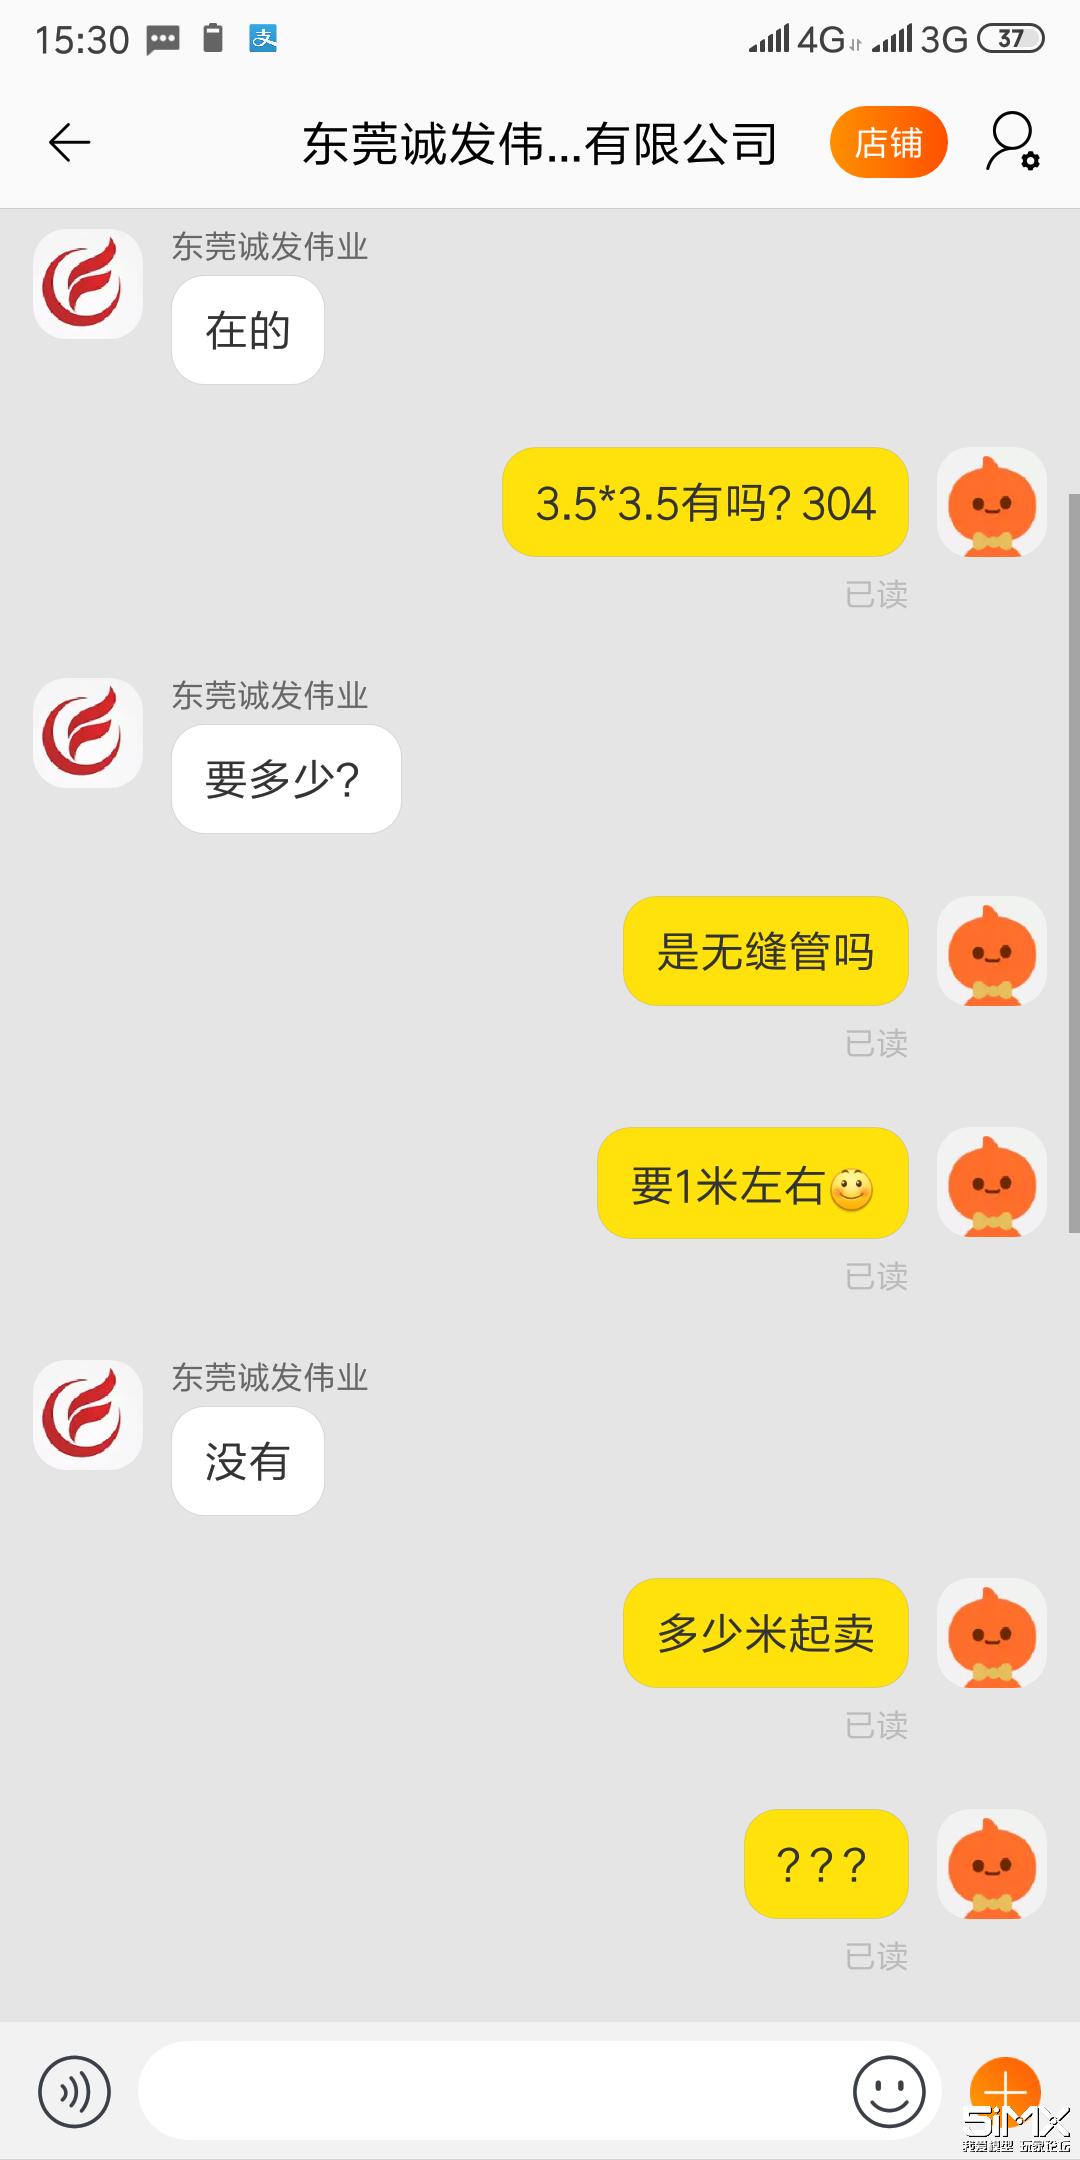 Screenshot_2019-08-13-15-30-40-765_com.taobao.taobao.png